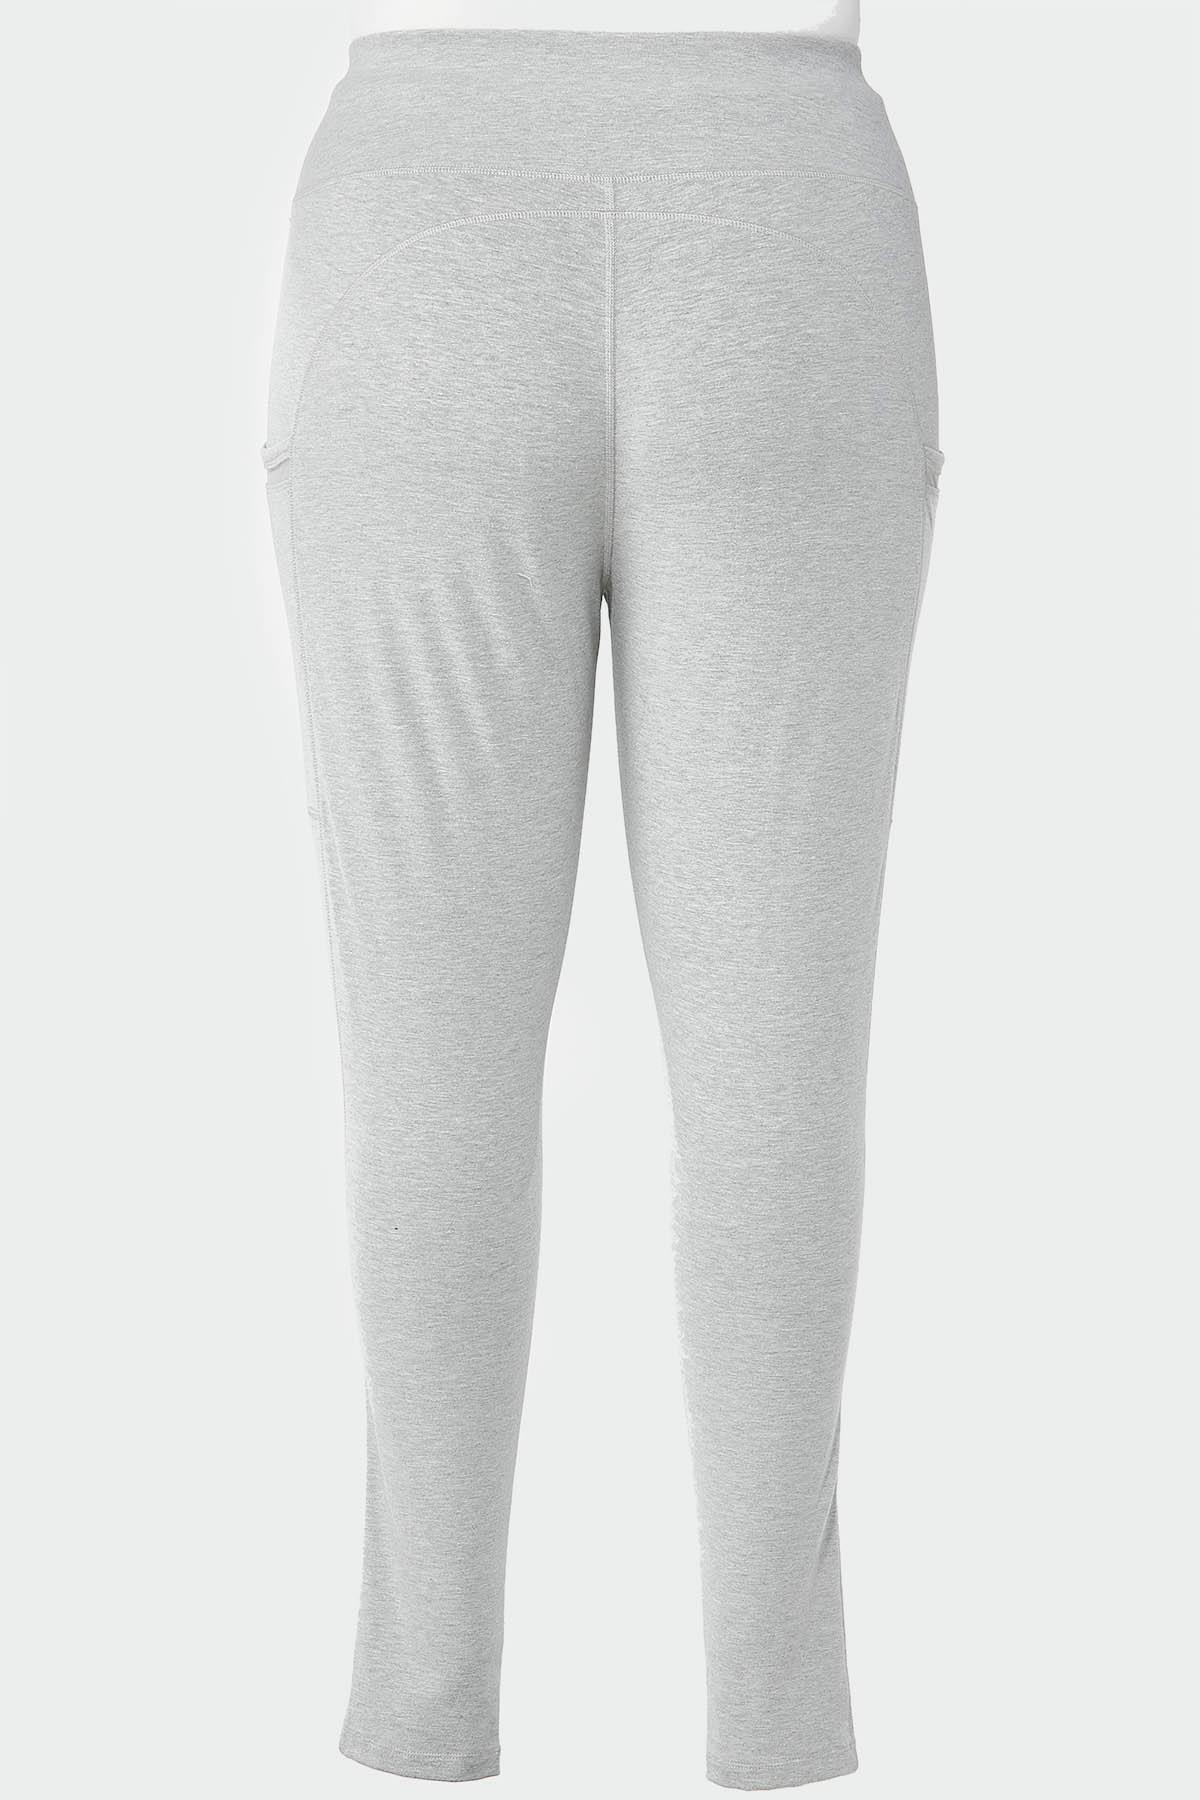 Plus Size Mesh Pocket Leggings (Item #44662220)